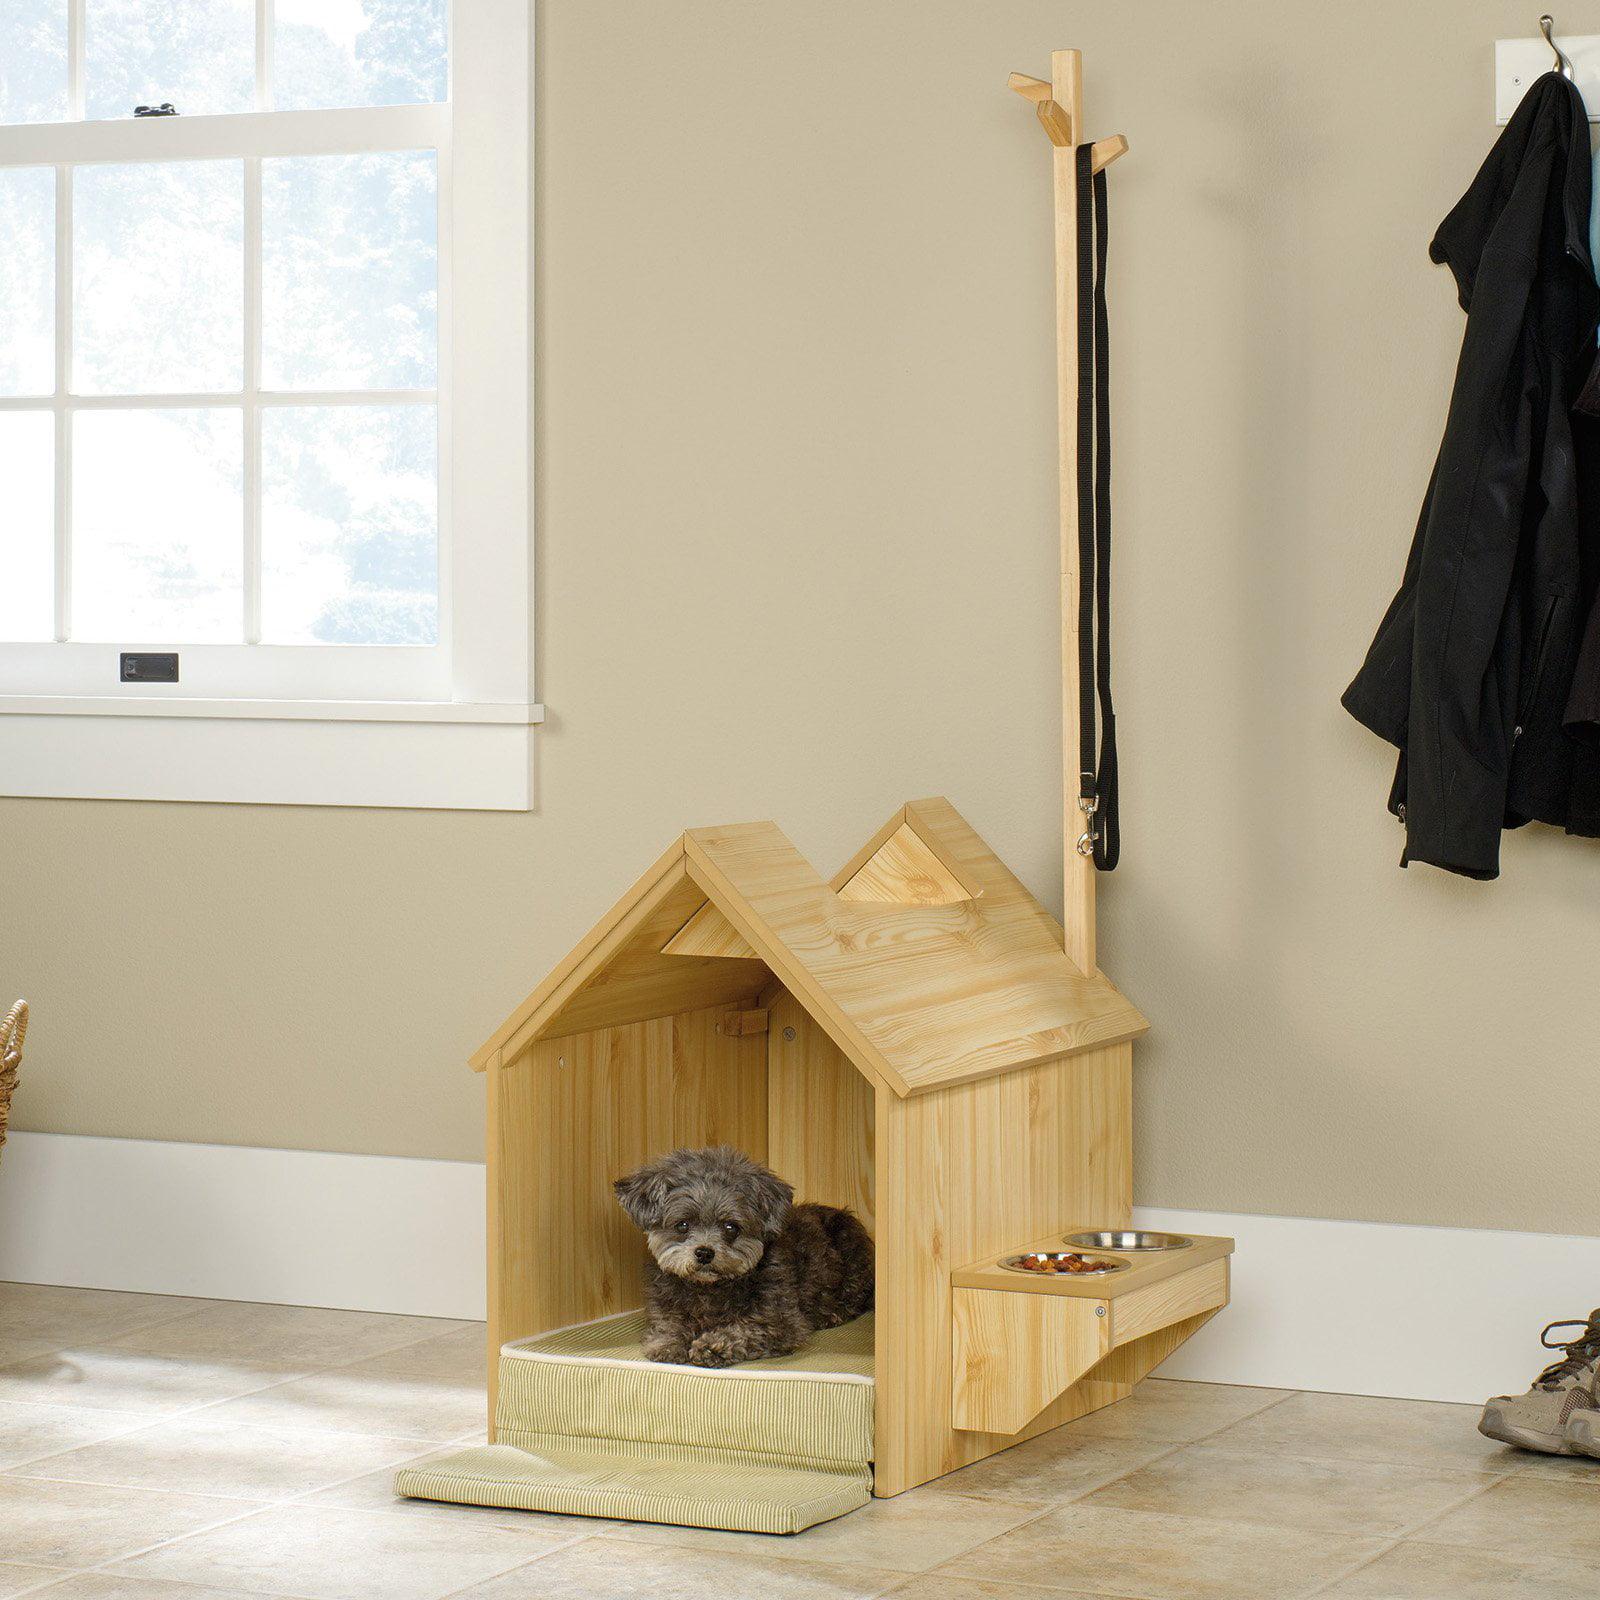 Sauder Woodworking Inside Dog House, Light Pine Finish